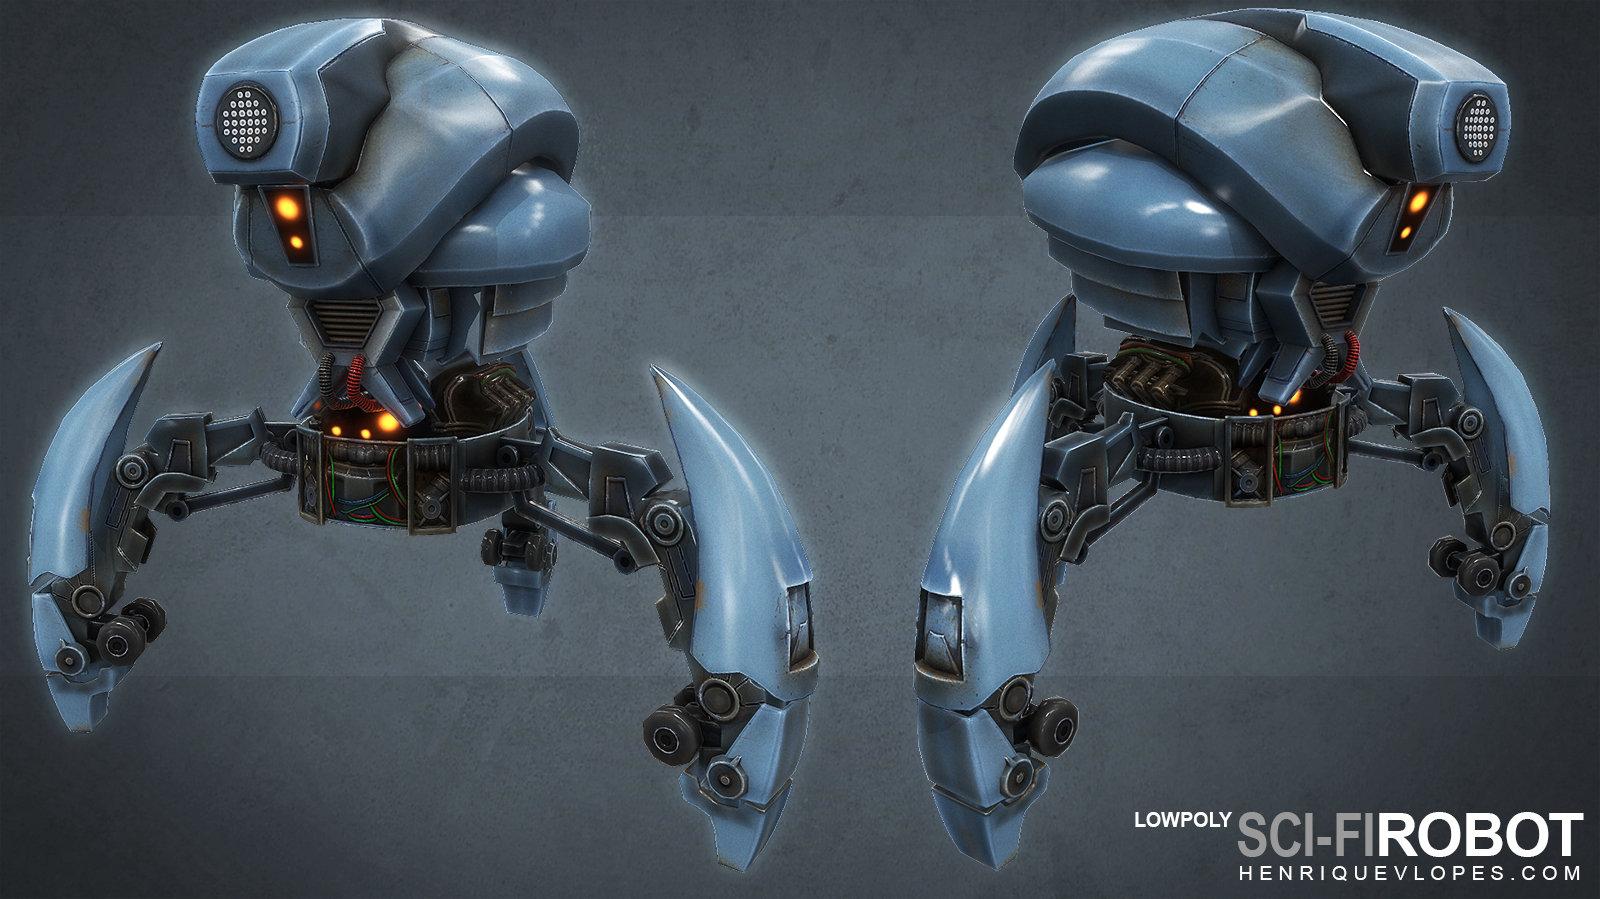 Scifirobot lowpoly01